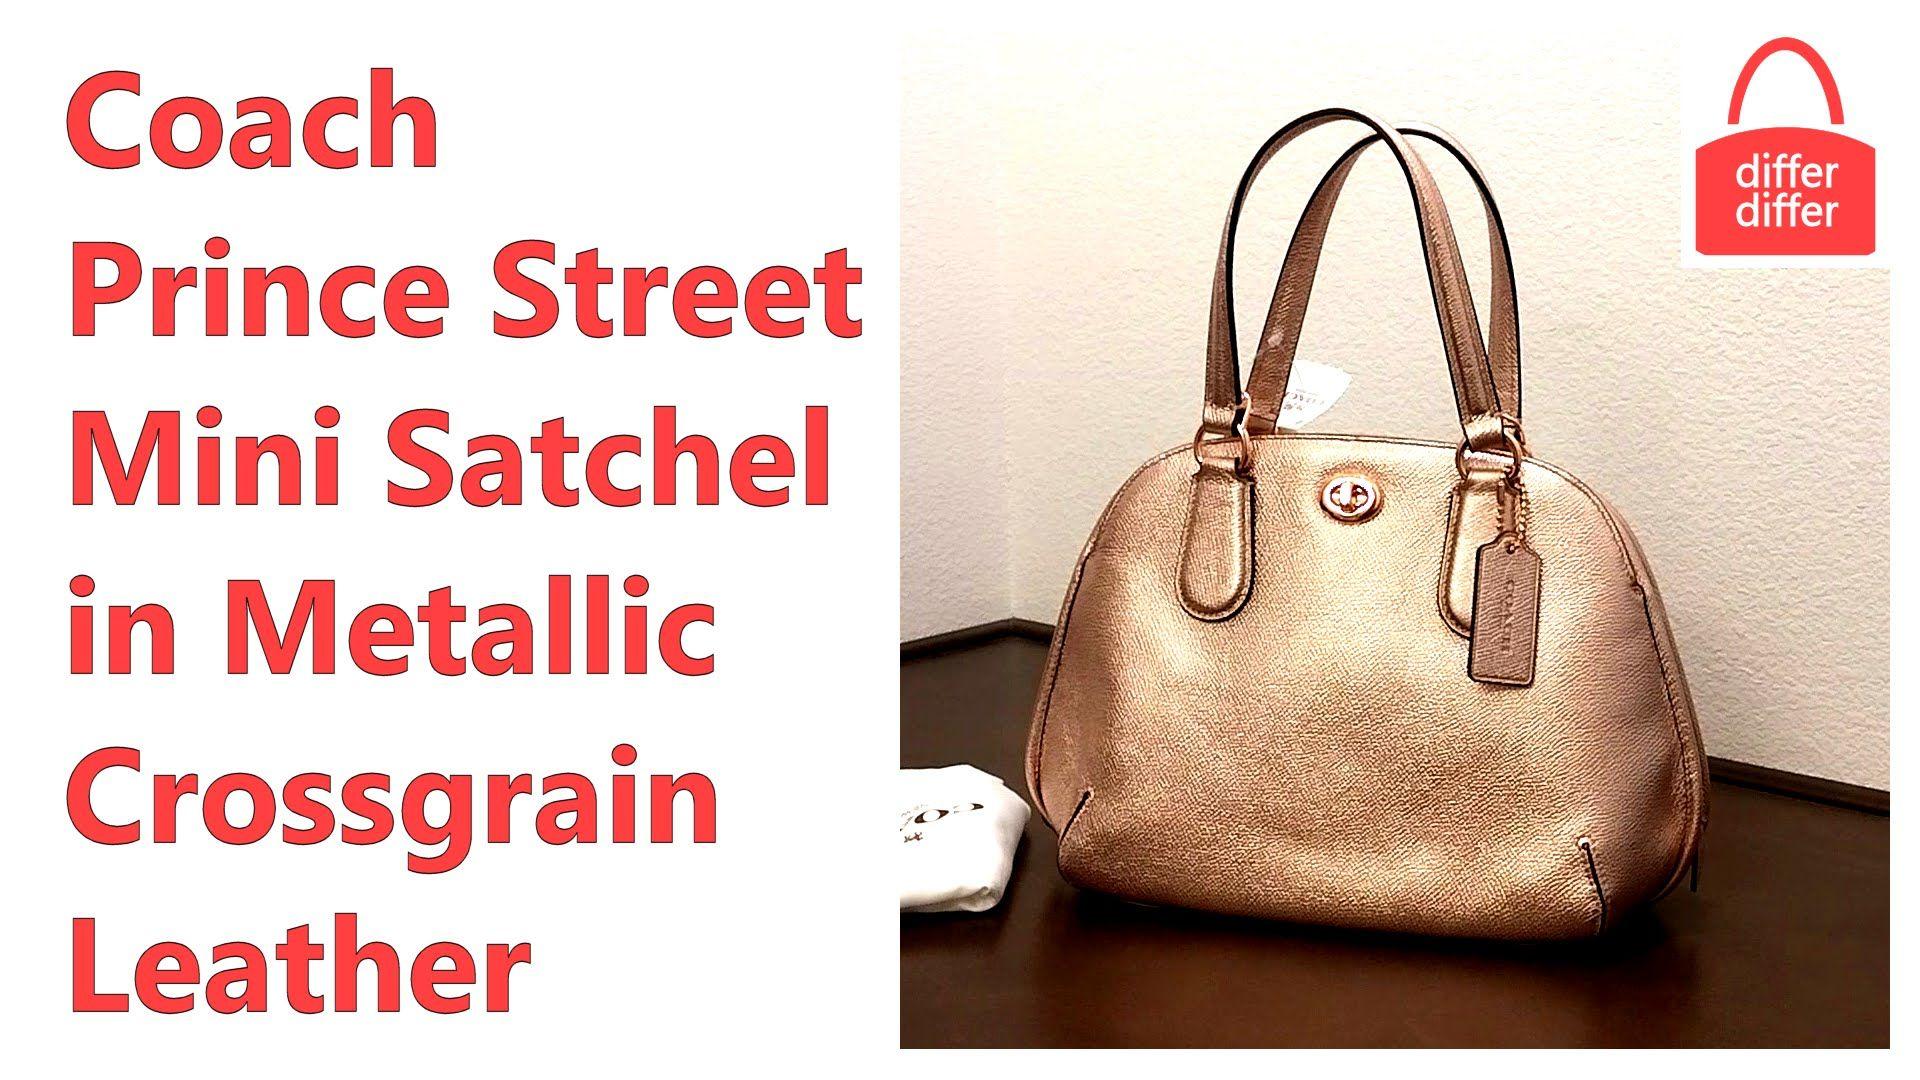 Coach Prince Street Mini Satchel in Metallic Crossgrain Leather